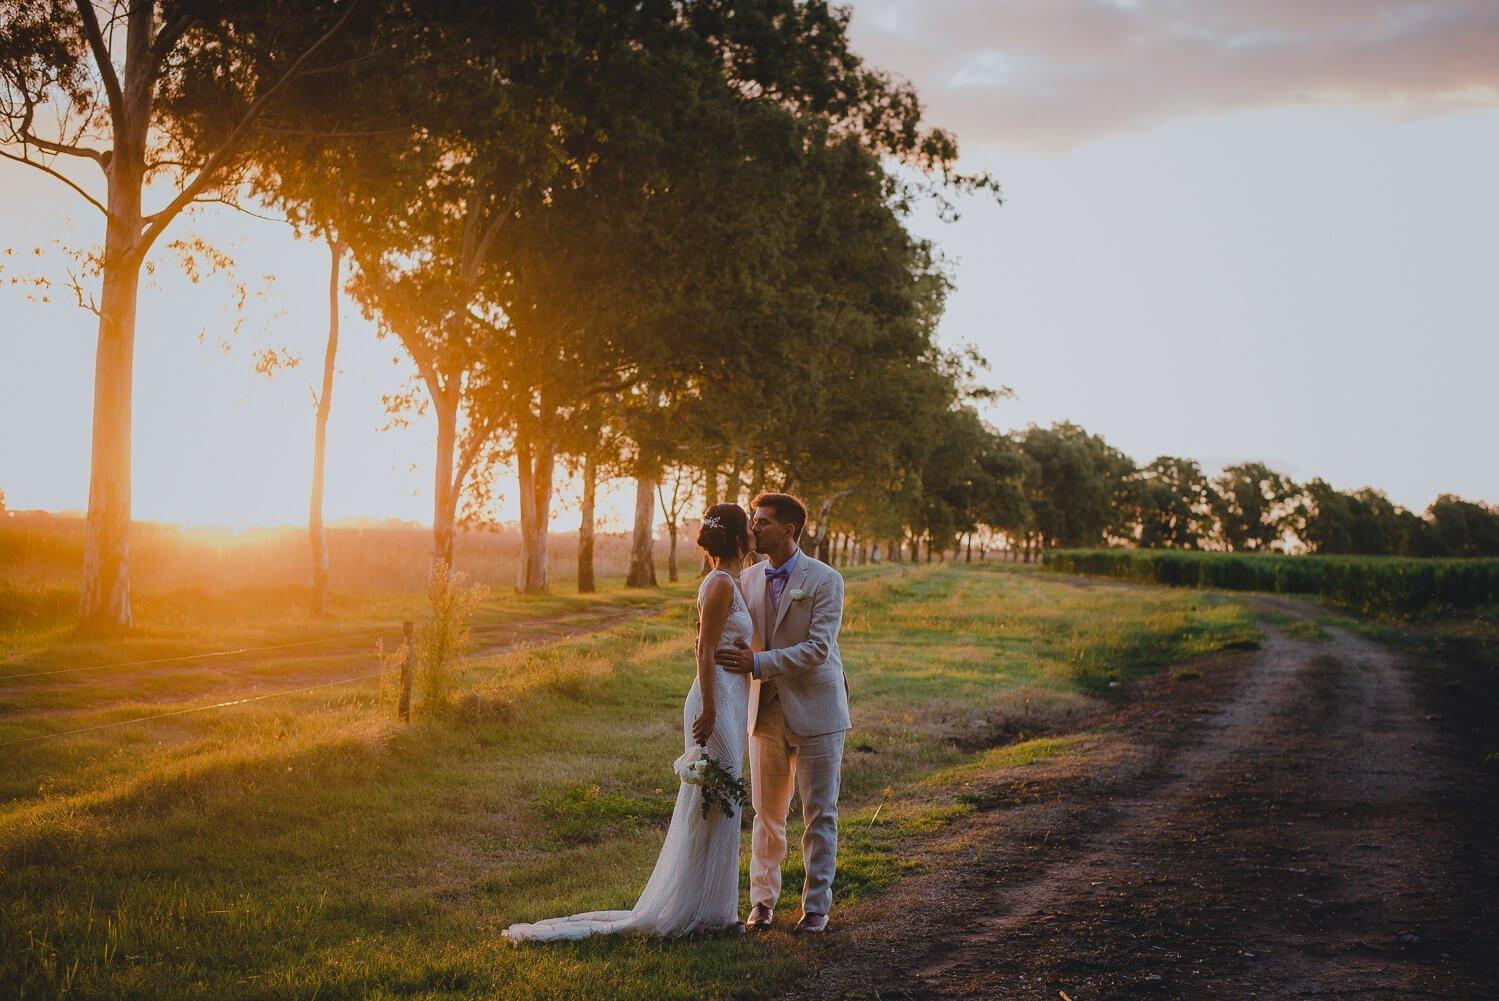 fotoreportaje-de-bodas-al-atardecer